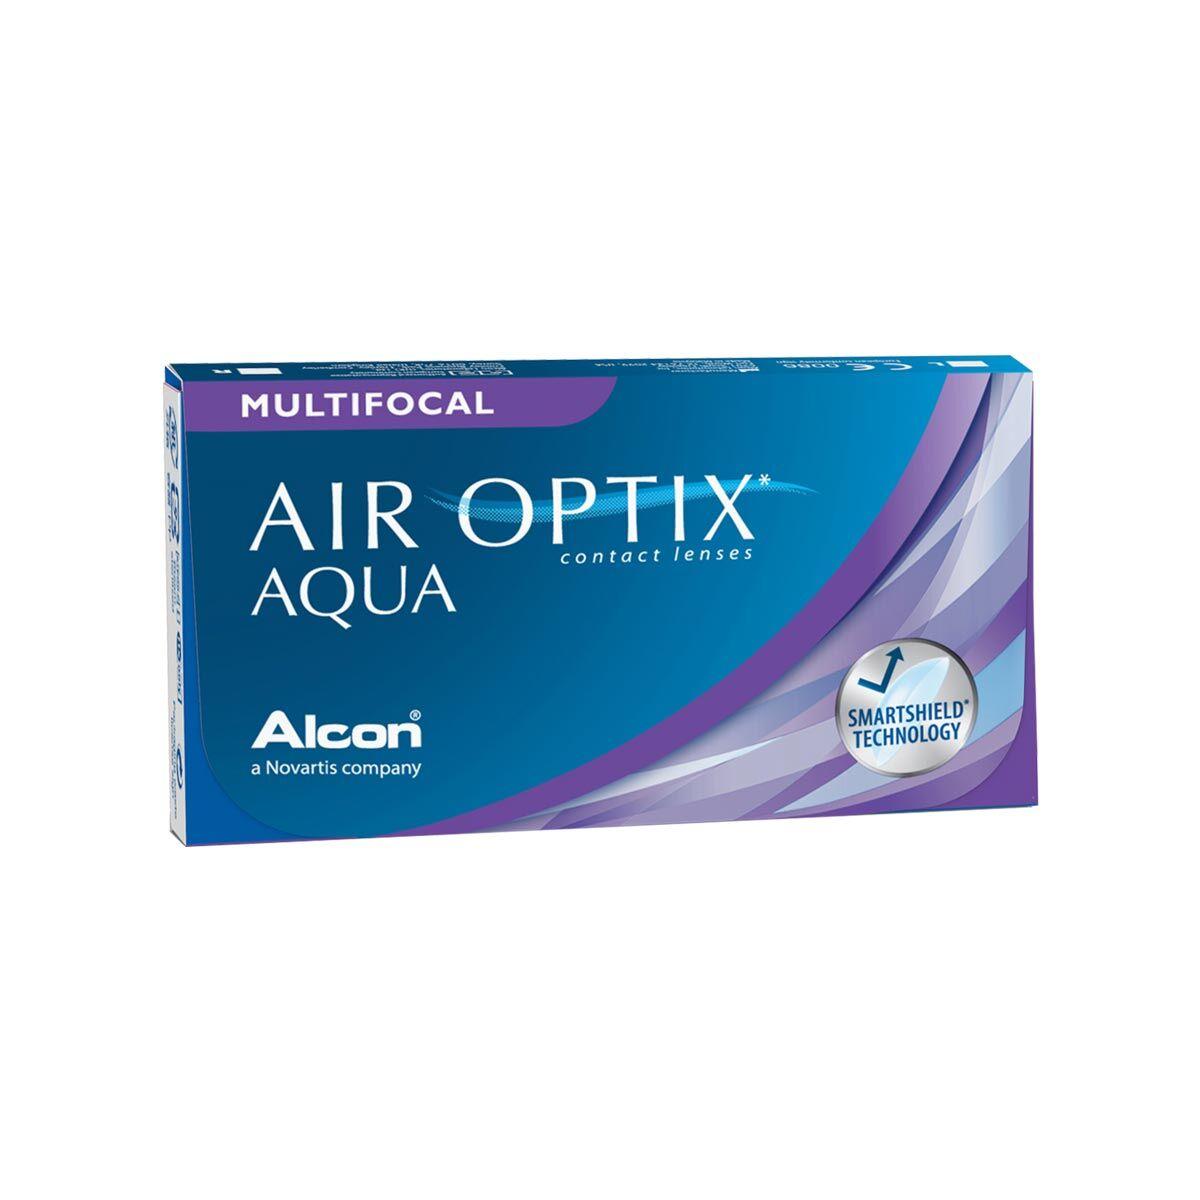 Alcon Air Optix Aqua Multifocal (3 Contact Lenses), Ciba Vision/Alcon, Multifocal Monthly Disposables, Lotrafilcon B